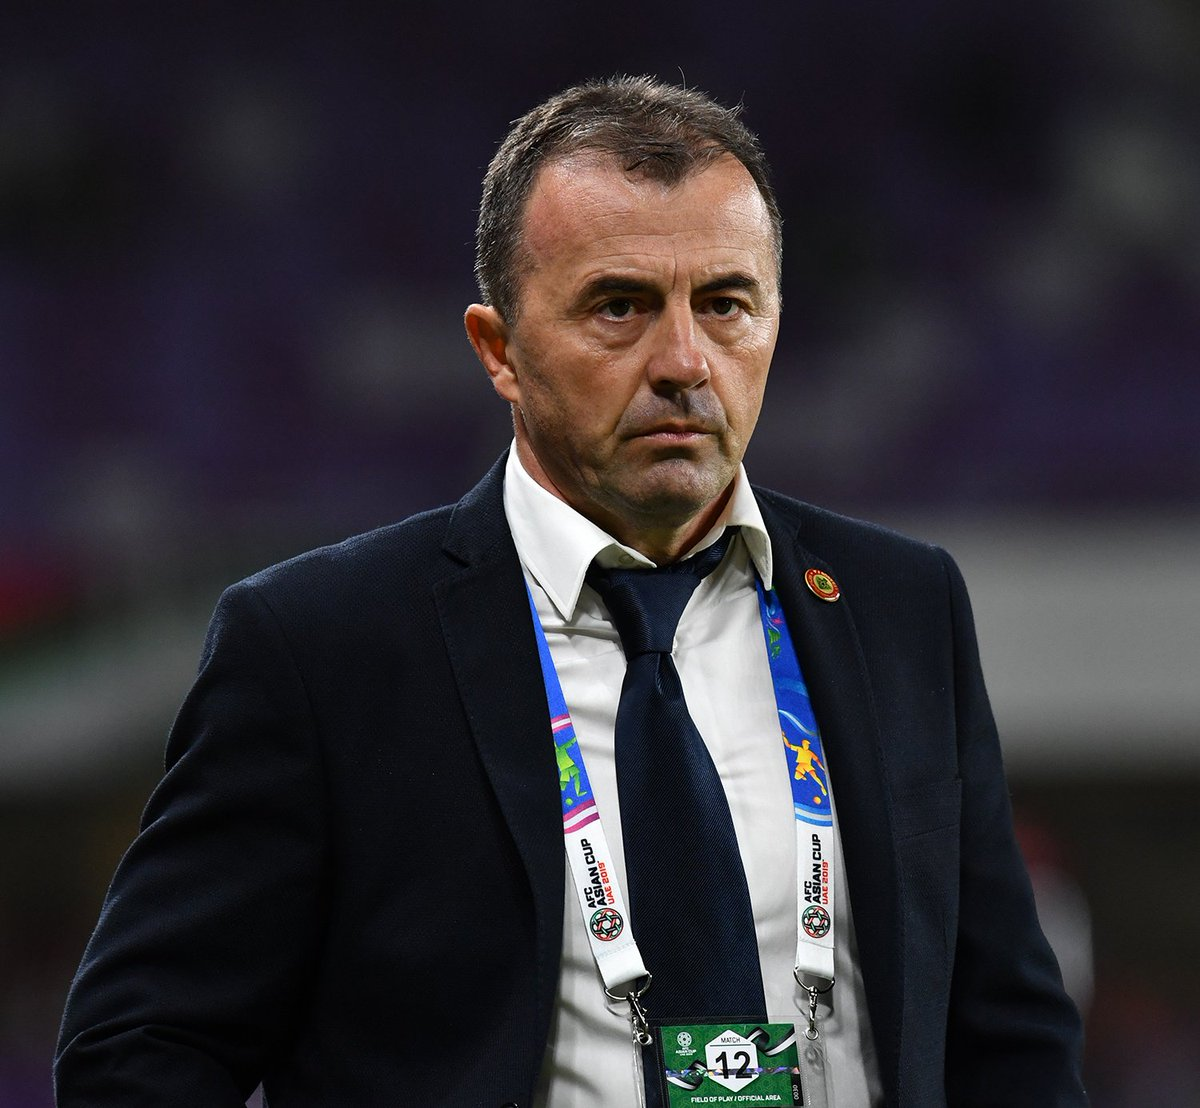 Former Lebanon head coach Miodrag Radulovic has been named the new head coach of Myanmar!